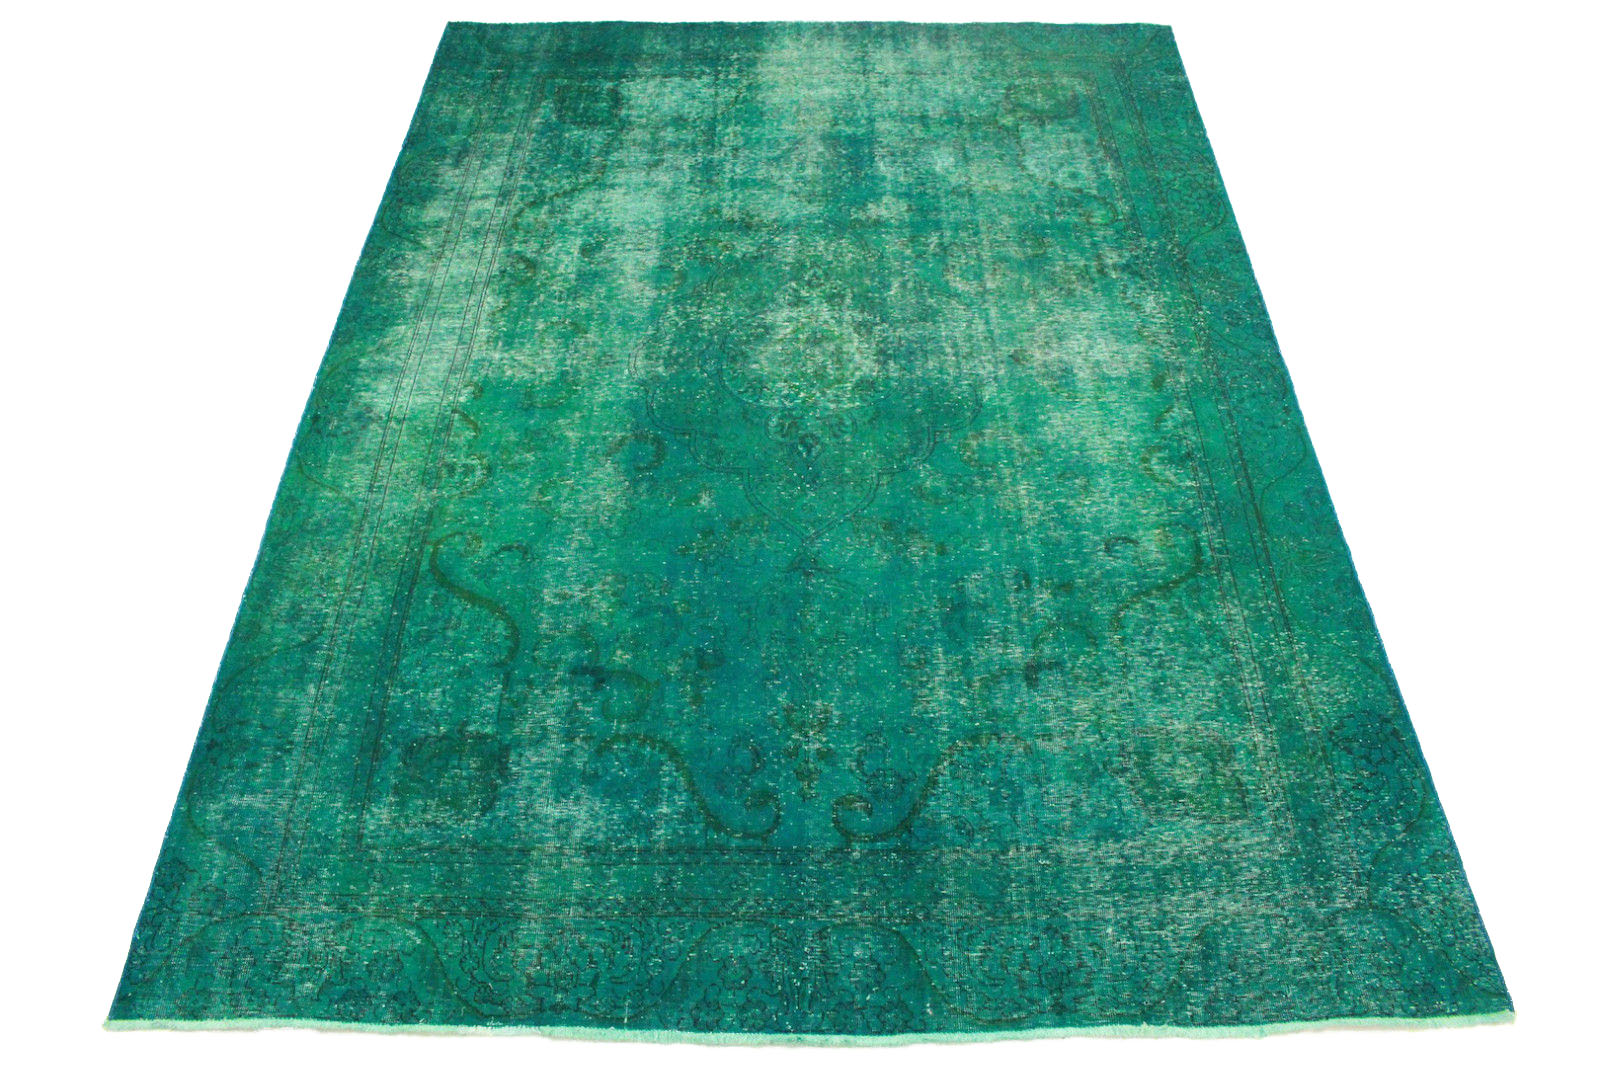 vintage teppich t rkis in 360x260cm 1001 3263 bei kaufen. Black Bedroom Furniture Sets. Home Design Ideas